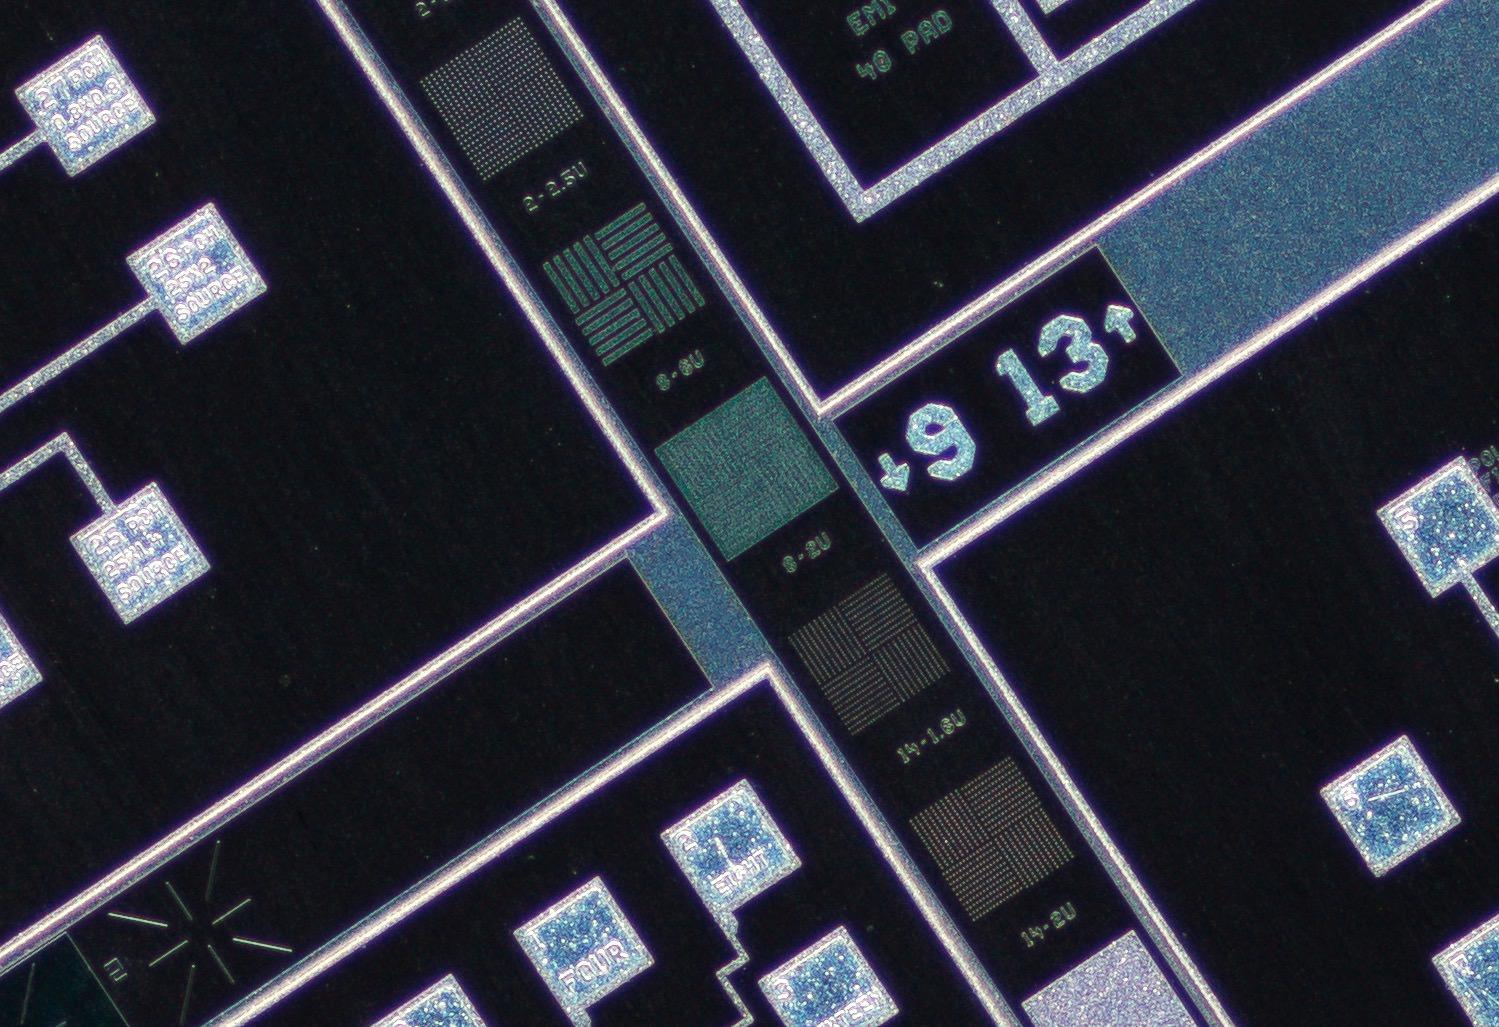 Nikon CFI Plan Fluor 4XA 4X/0.13 ∞/- Microscope Objective 100% actual pixel view center crop. Clicking on an image will open a larger version.